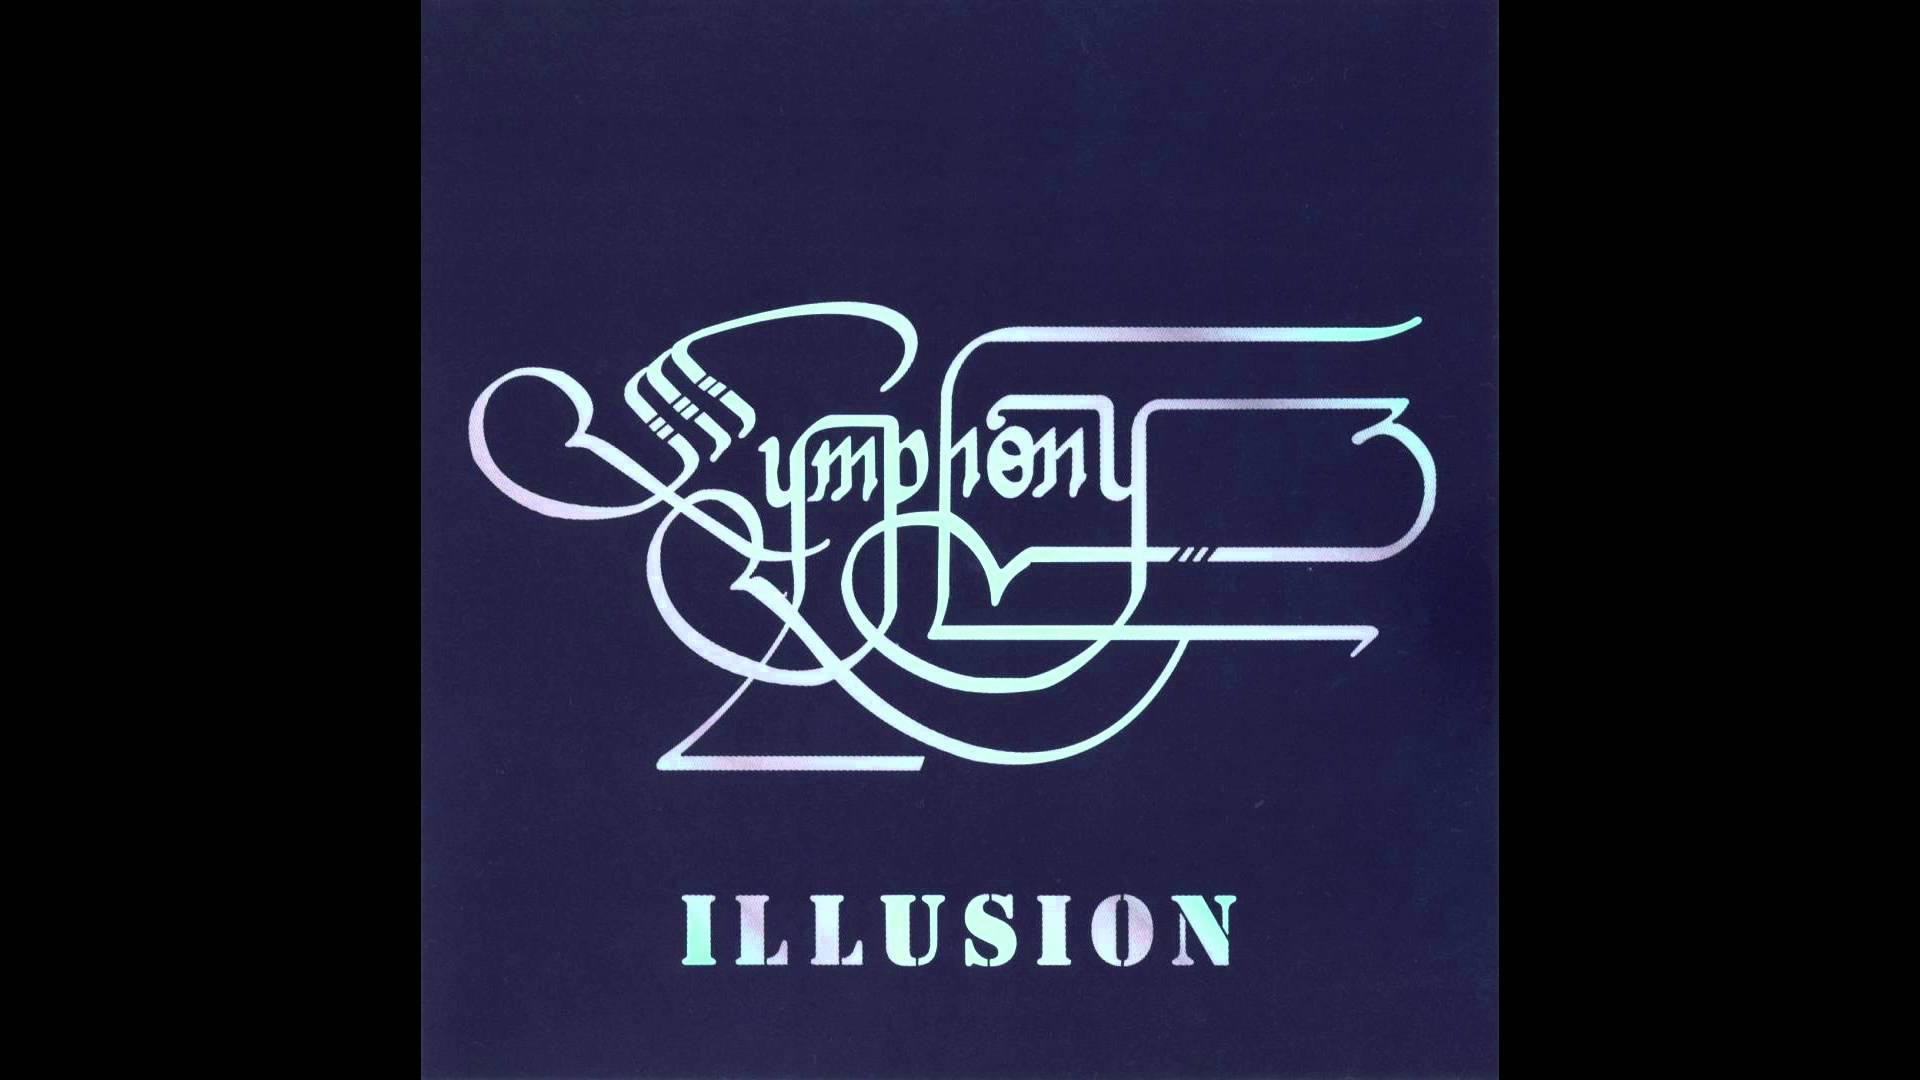 Symphony - Illusion (Full EP HQ)